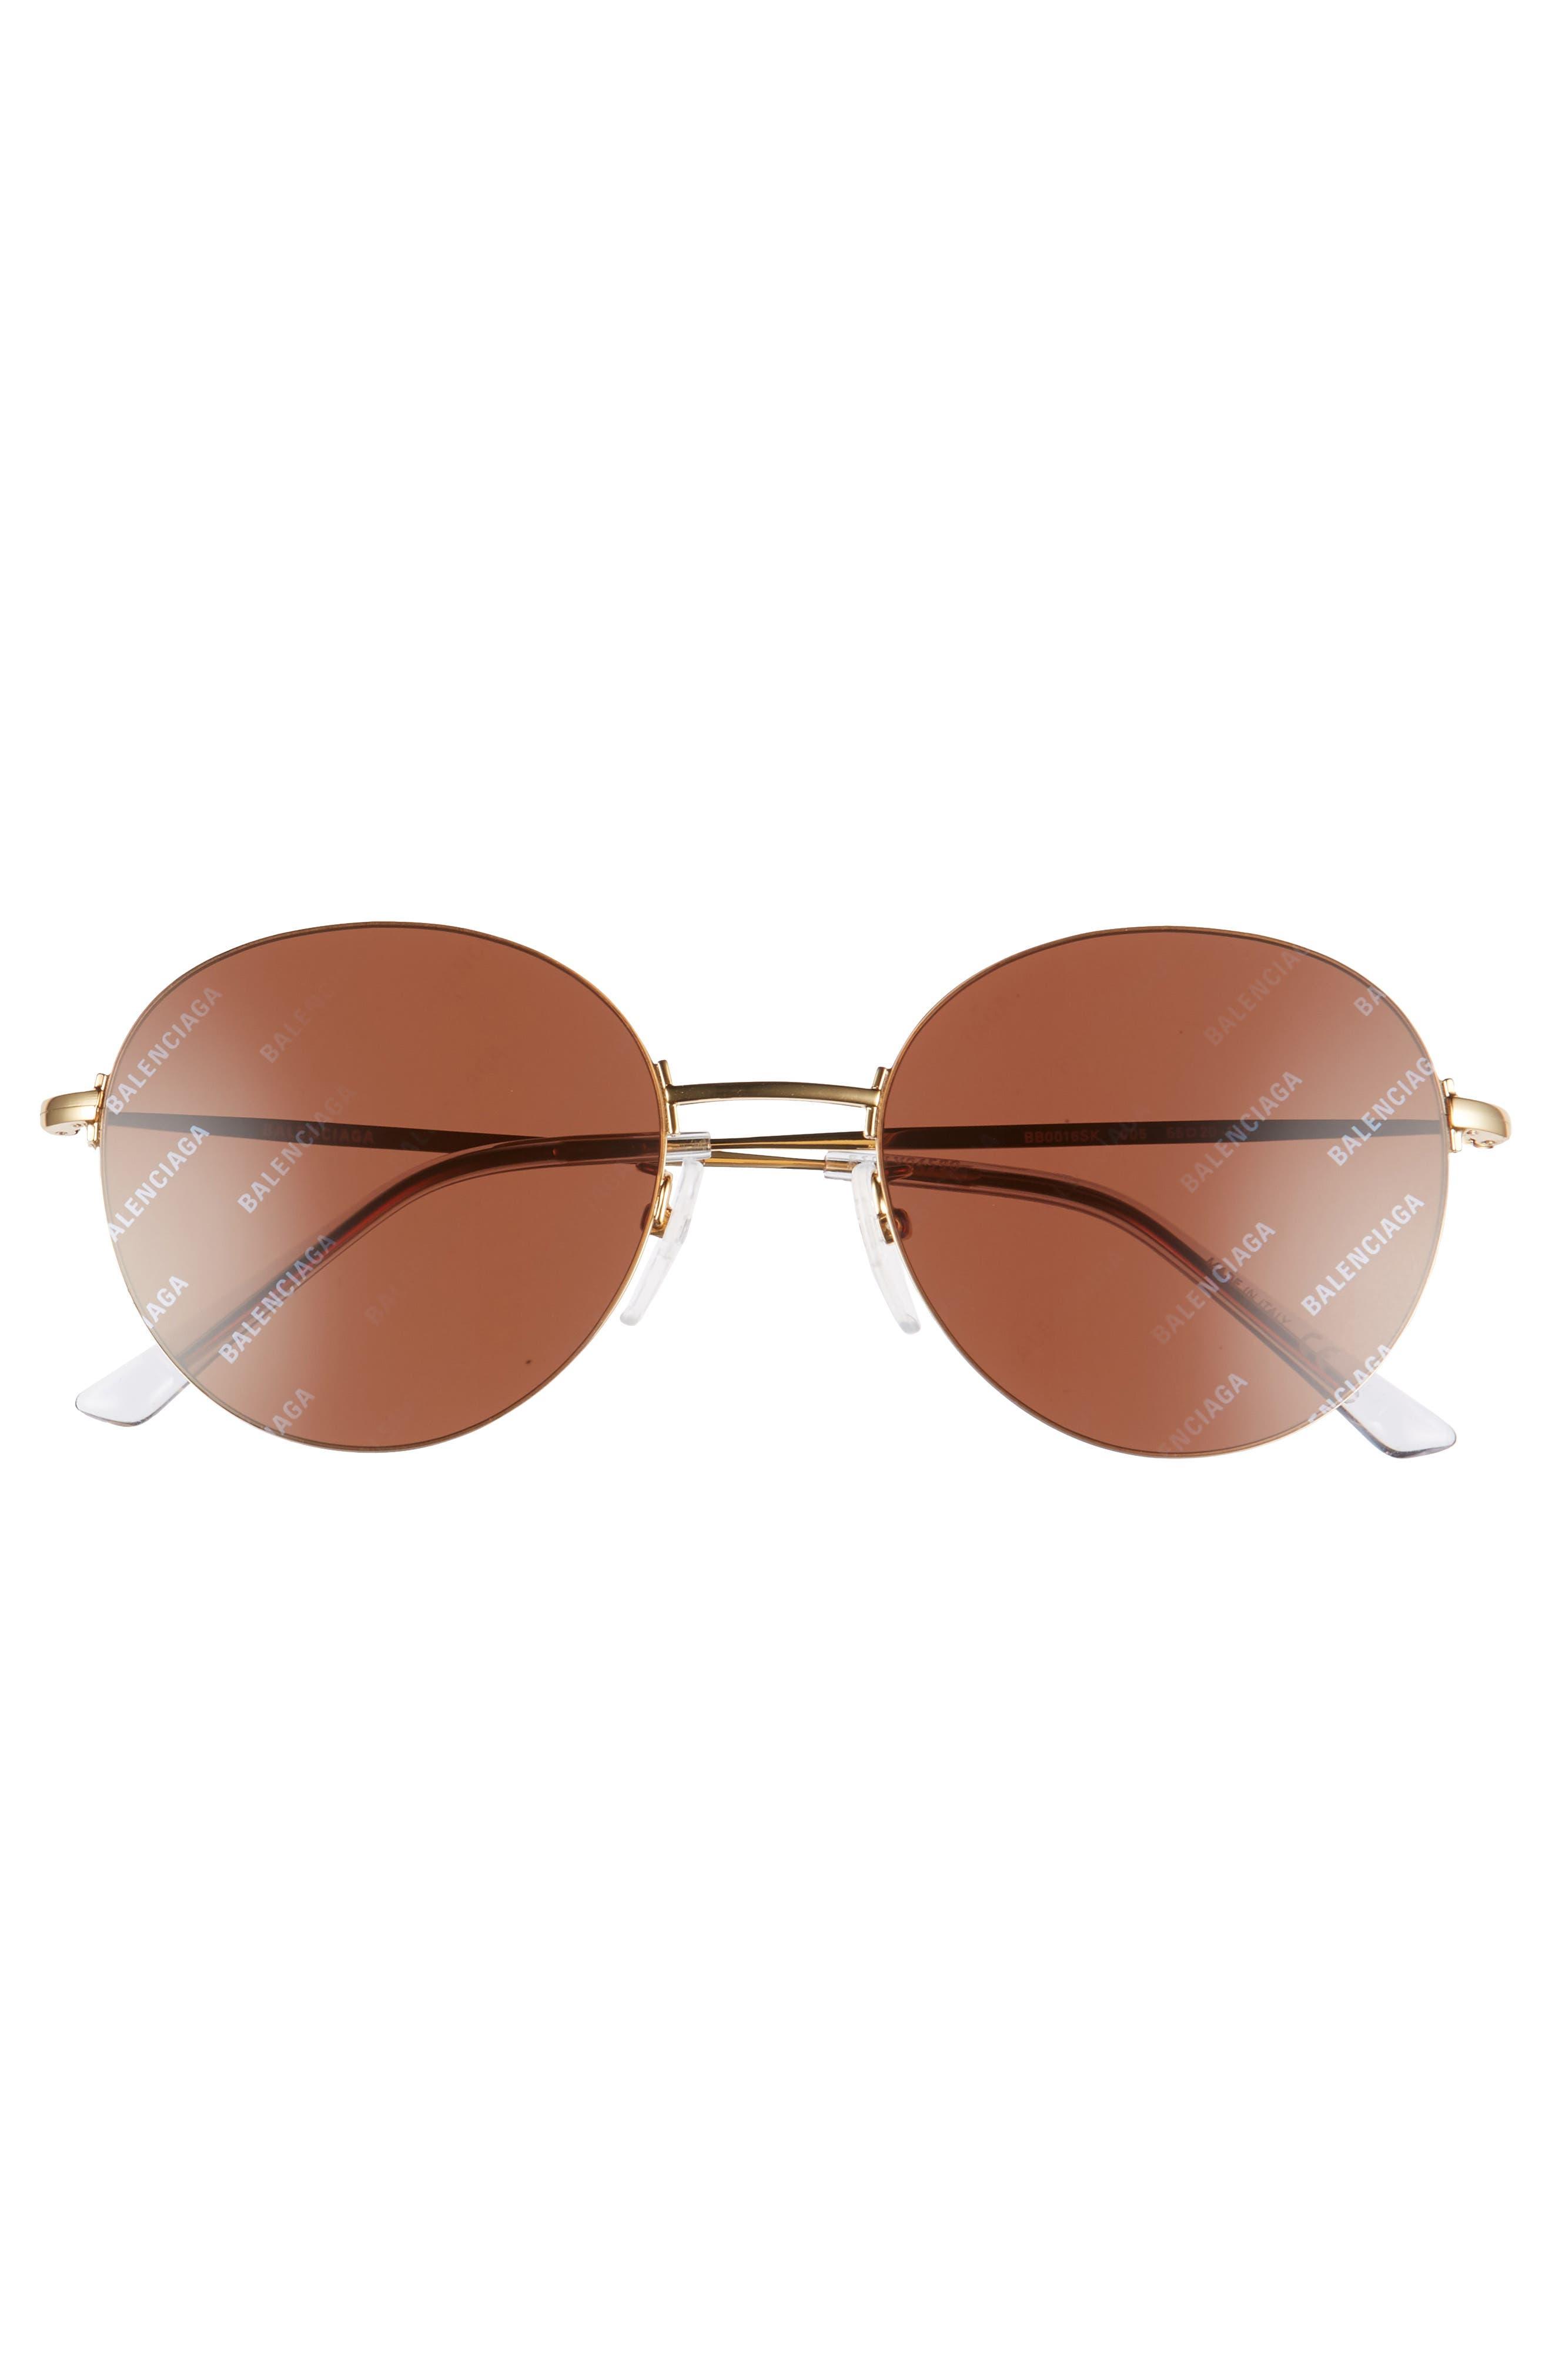 BALENCIAGA, 55mm Round Sunglasses, Alternate thumbnail 3, color, SHINY ENDURA GOLD/ BROWN